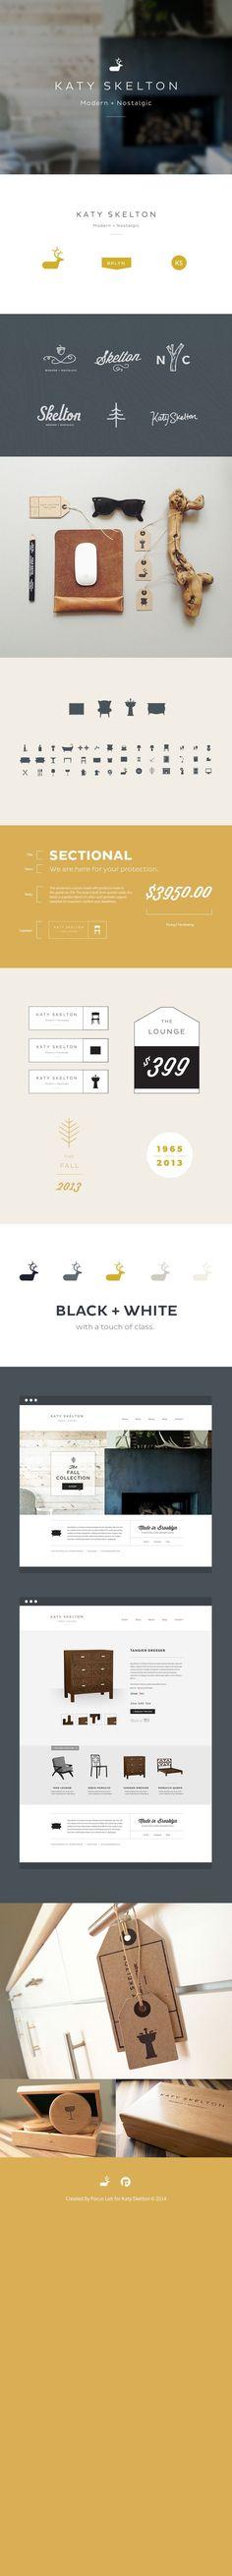 Katy Skelton Branding, Icon Design, Web Design